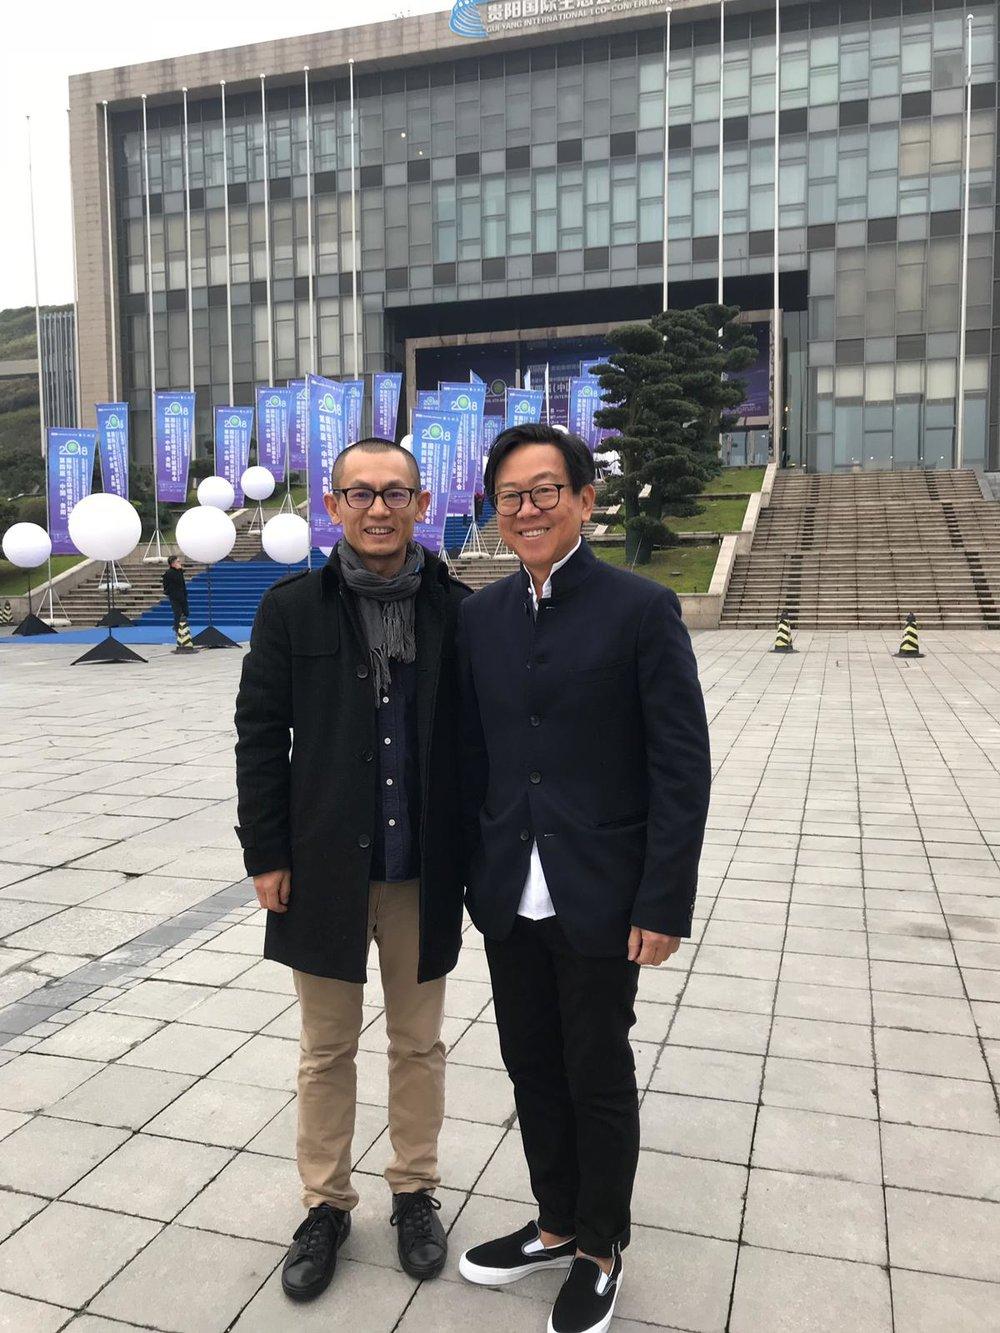 With local designer韓老師